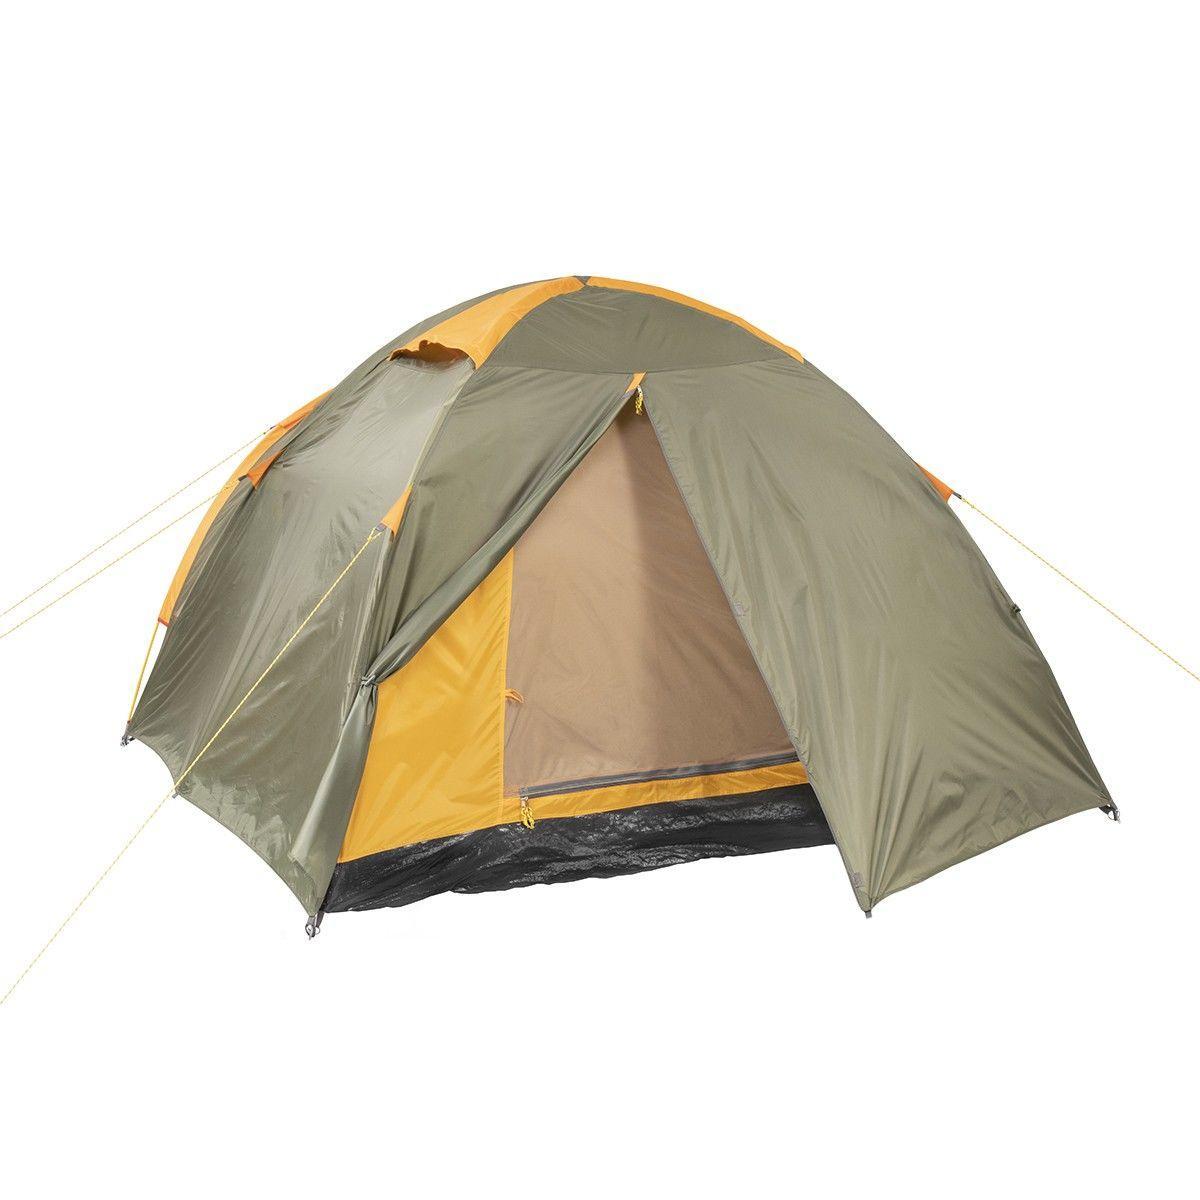 Палатка MUSSON-4 Helios зеленый-оранжевый HS-2366-4 GO - фото 3